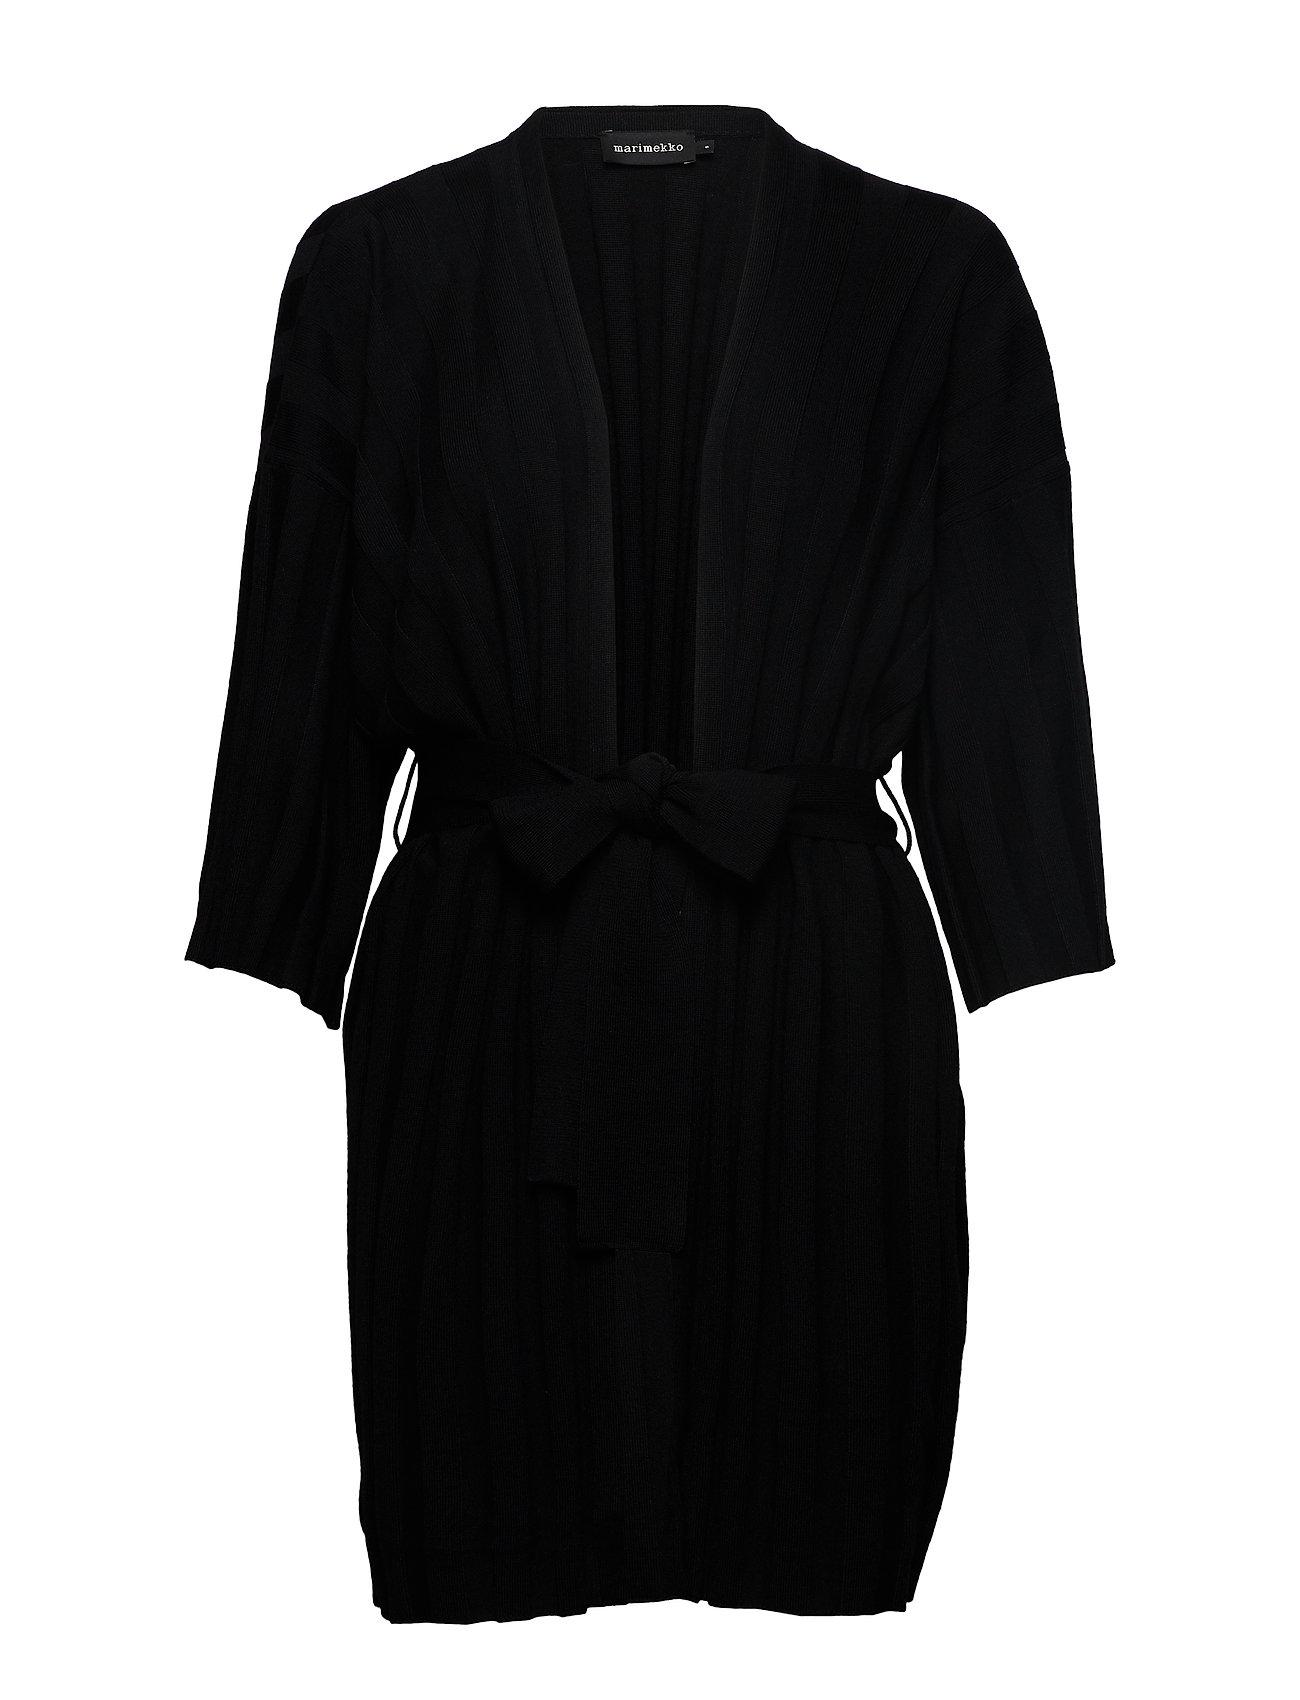 Marimekko VELLOVA SOLID Knit cardigan - BLACK